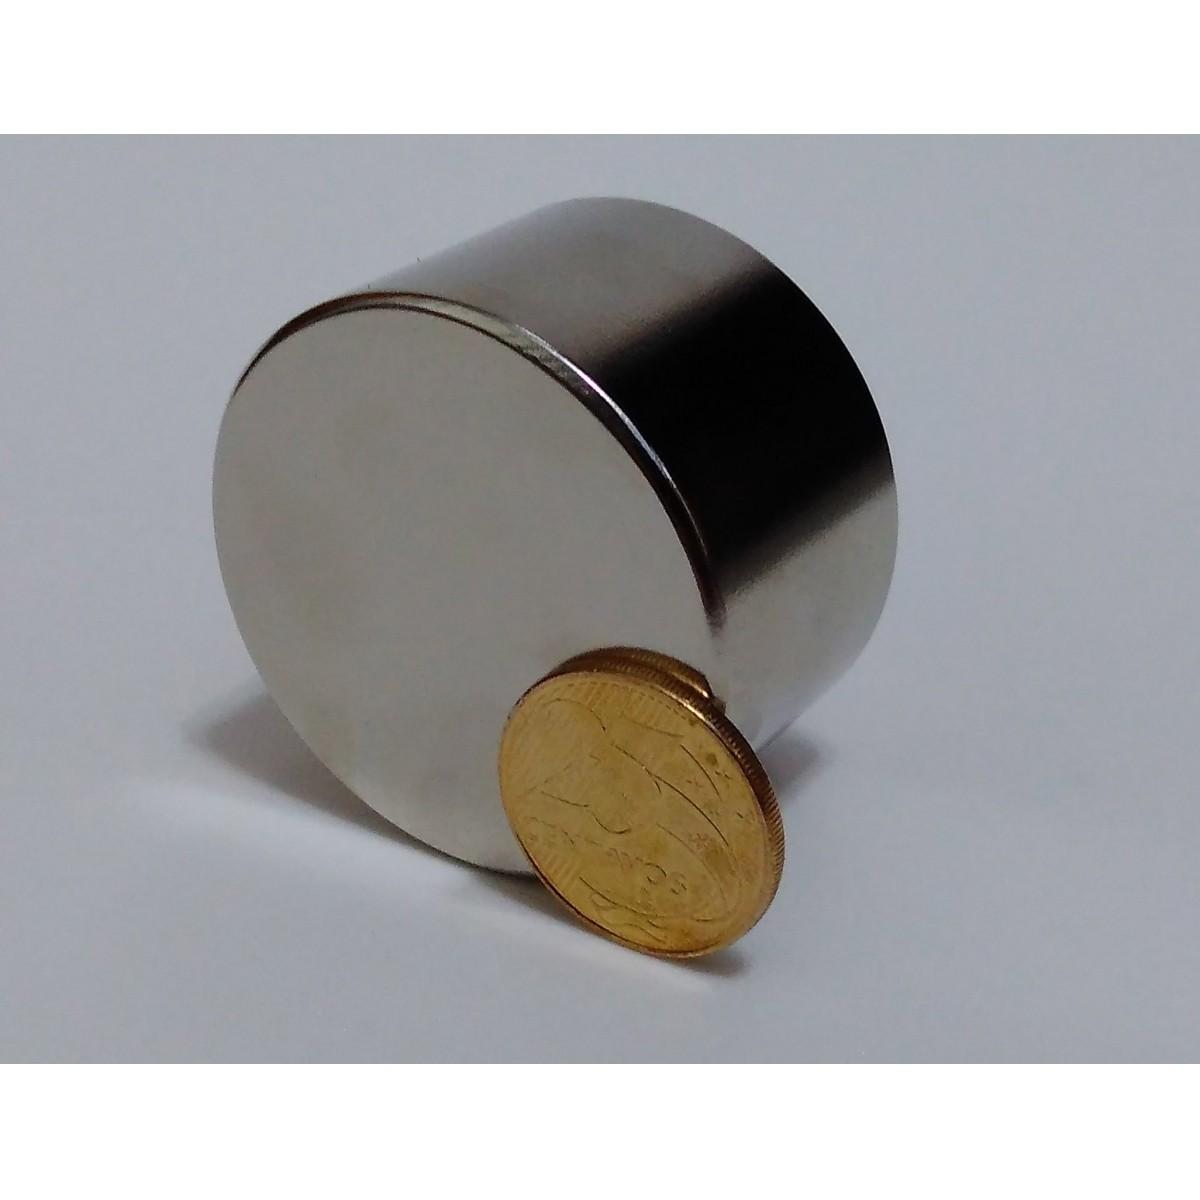 Ima De Neodímio 50,8mm X 30mm Grau N50 Super Forte